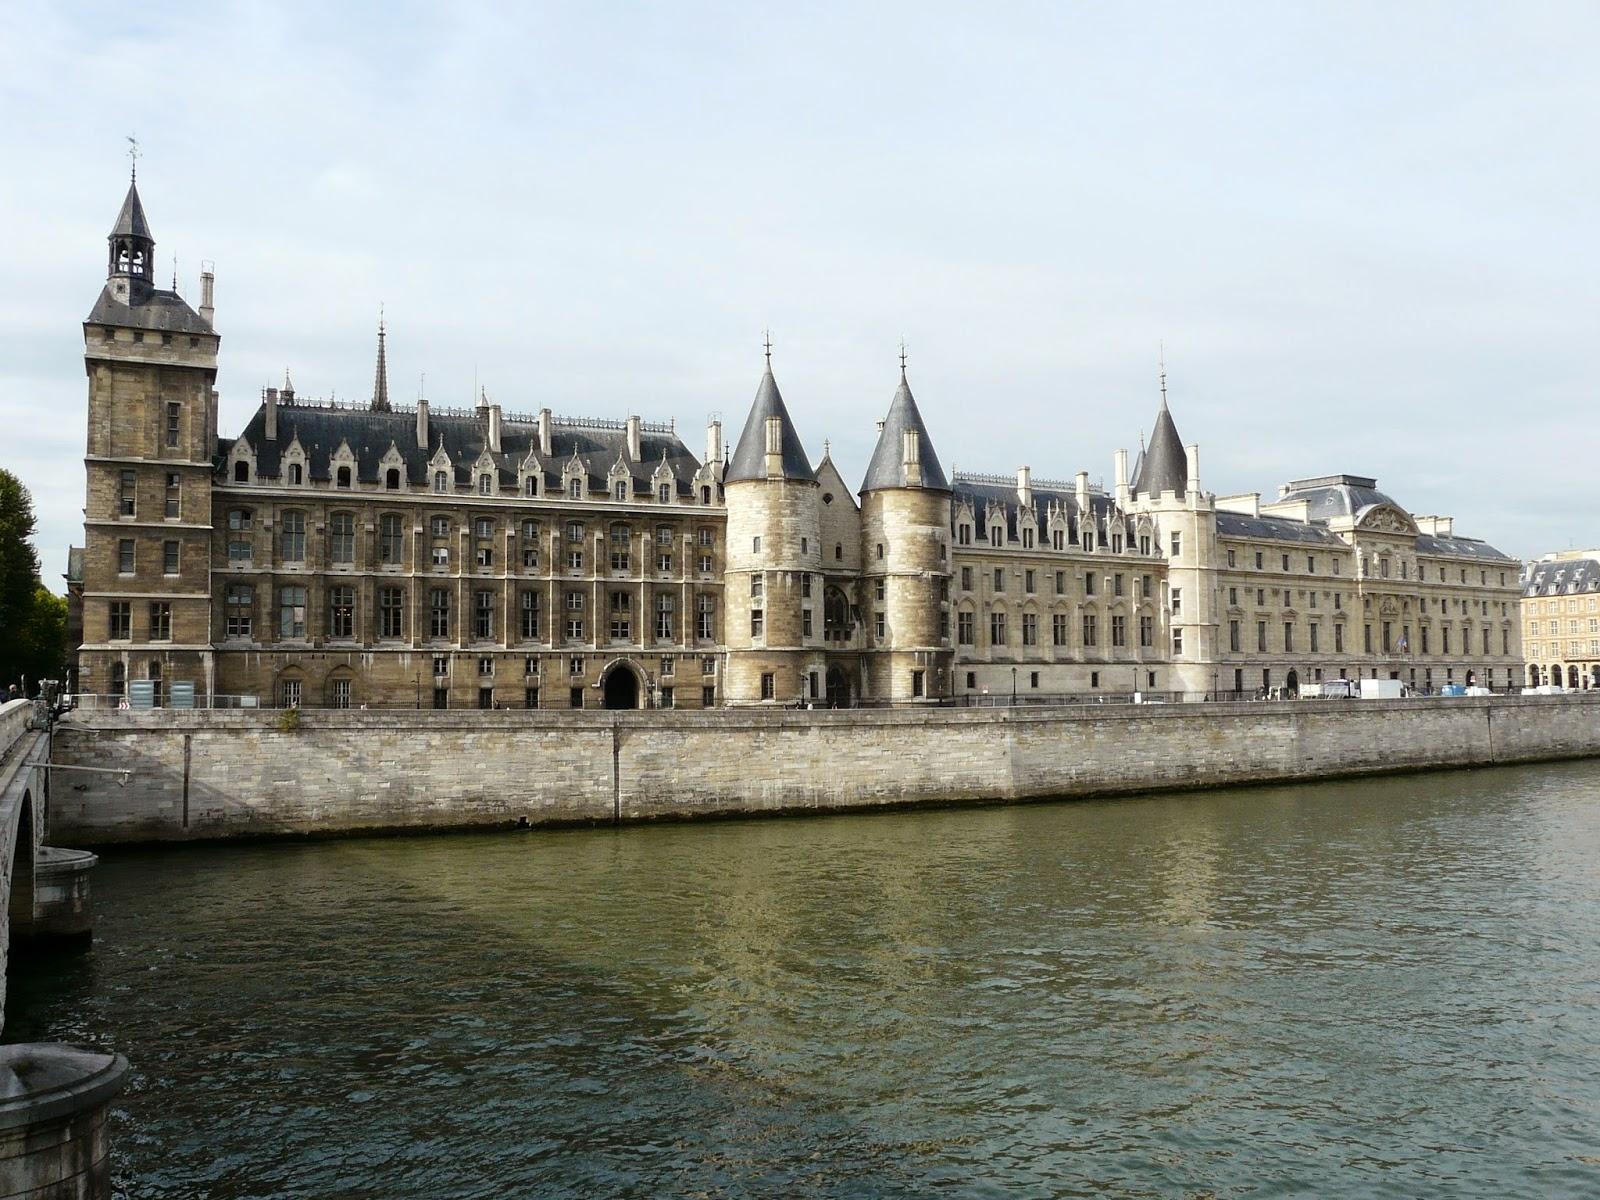 Lauele 39 s world travel stories 7 parigi 1 parte for Architettura a parigi